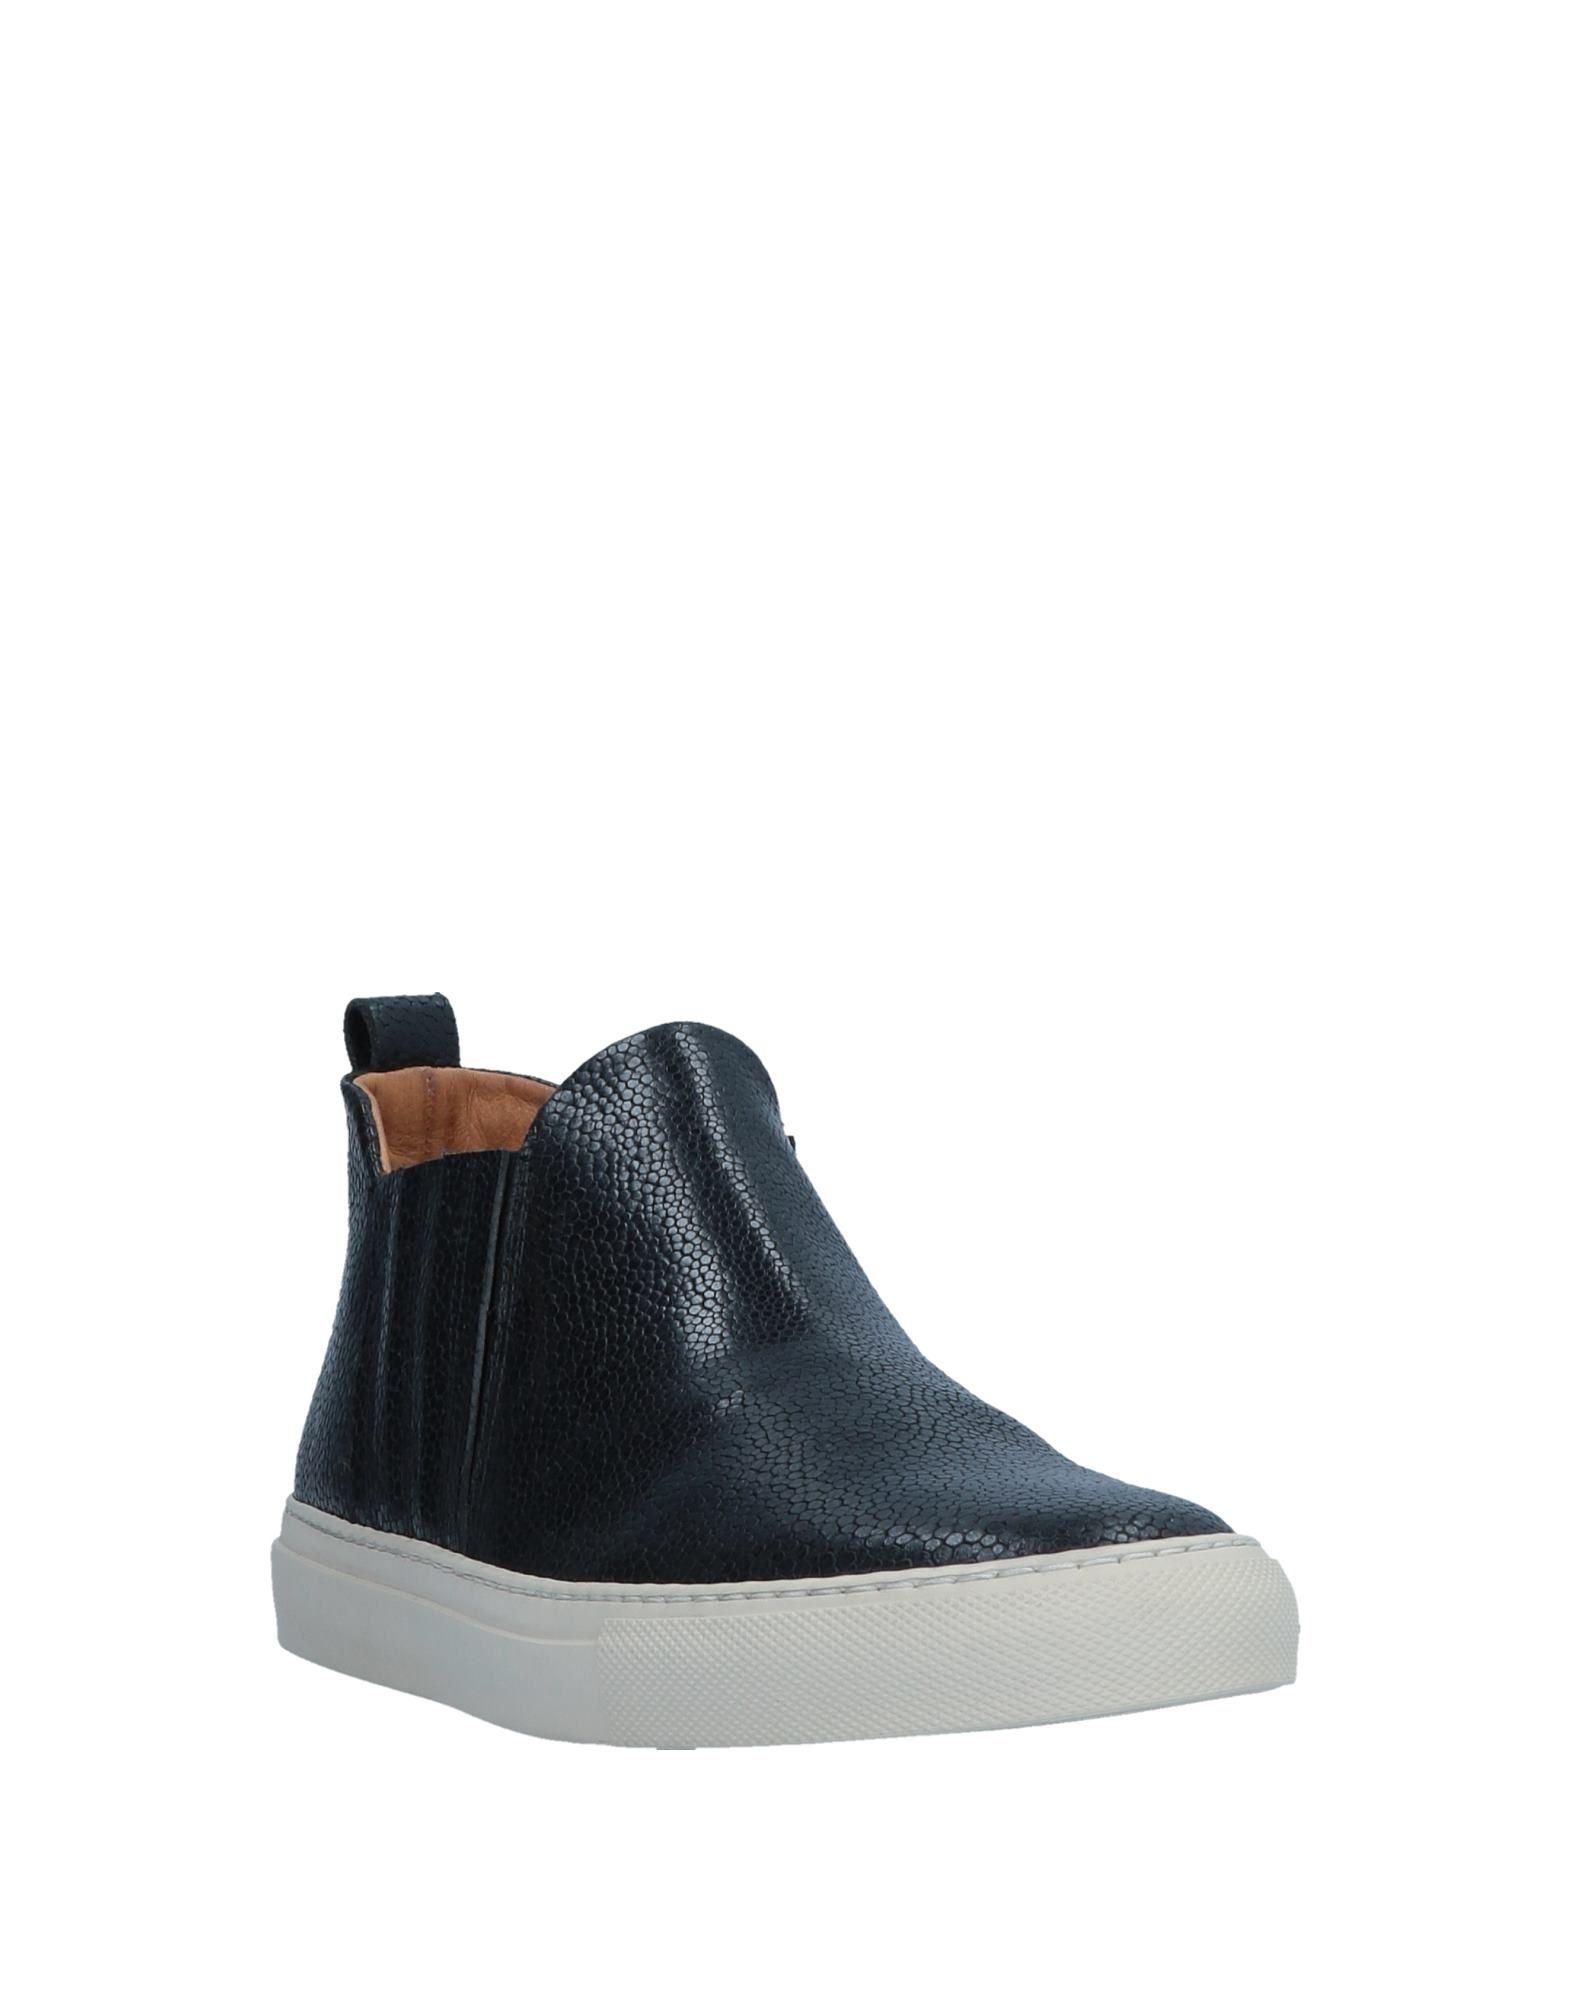 Stilvolle billige Schuhe Damen Buttero® Sneakers Damen Schuhe  11553386AC 73922e